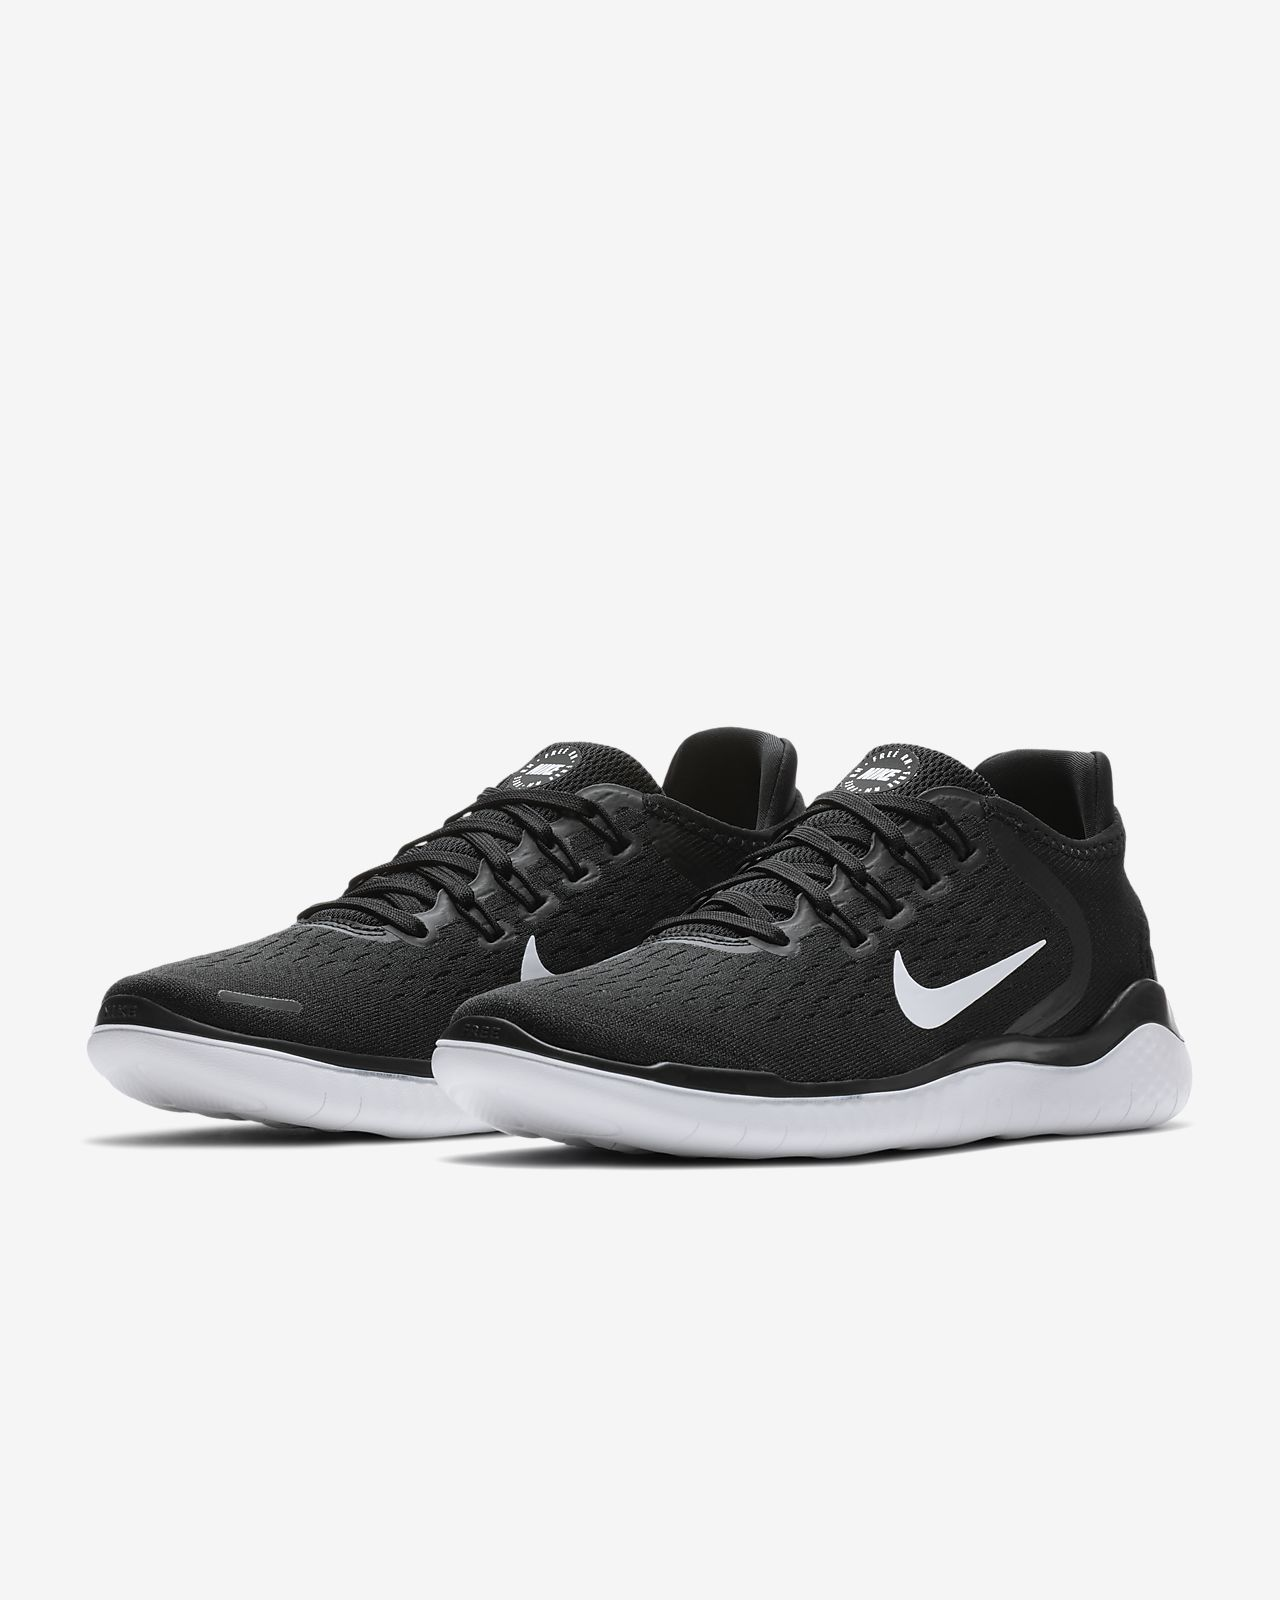 Nike Free RN 2018 Zapatillas de running - Mujer